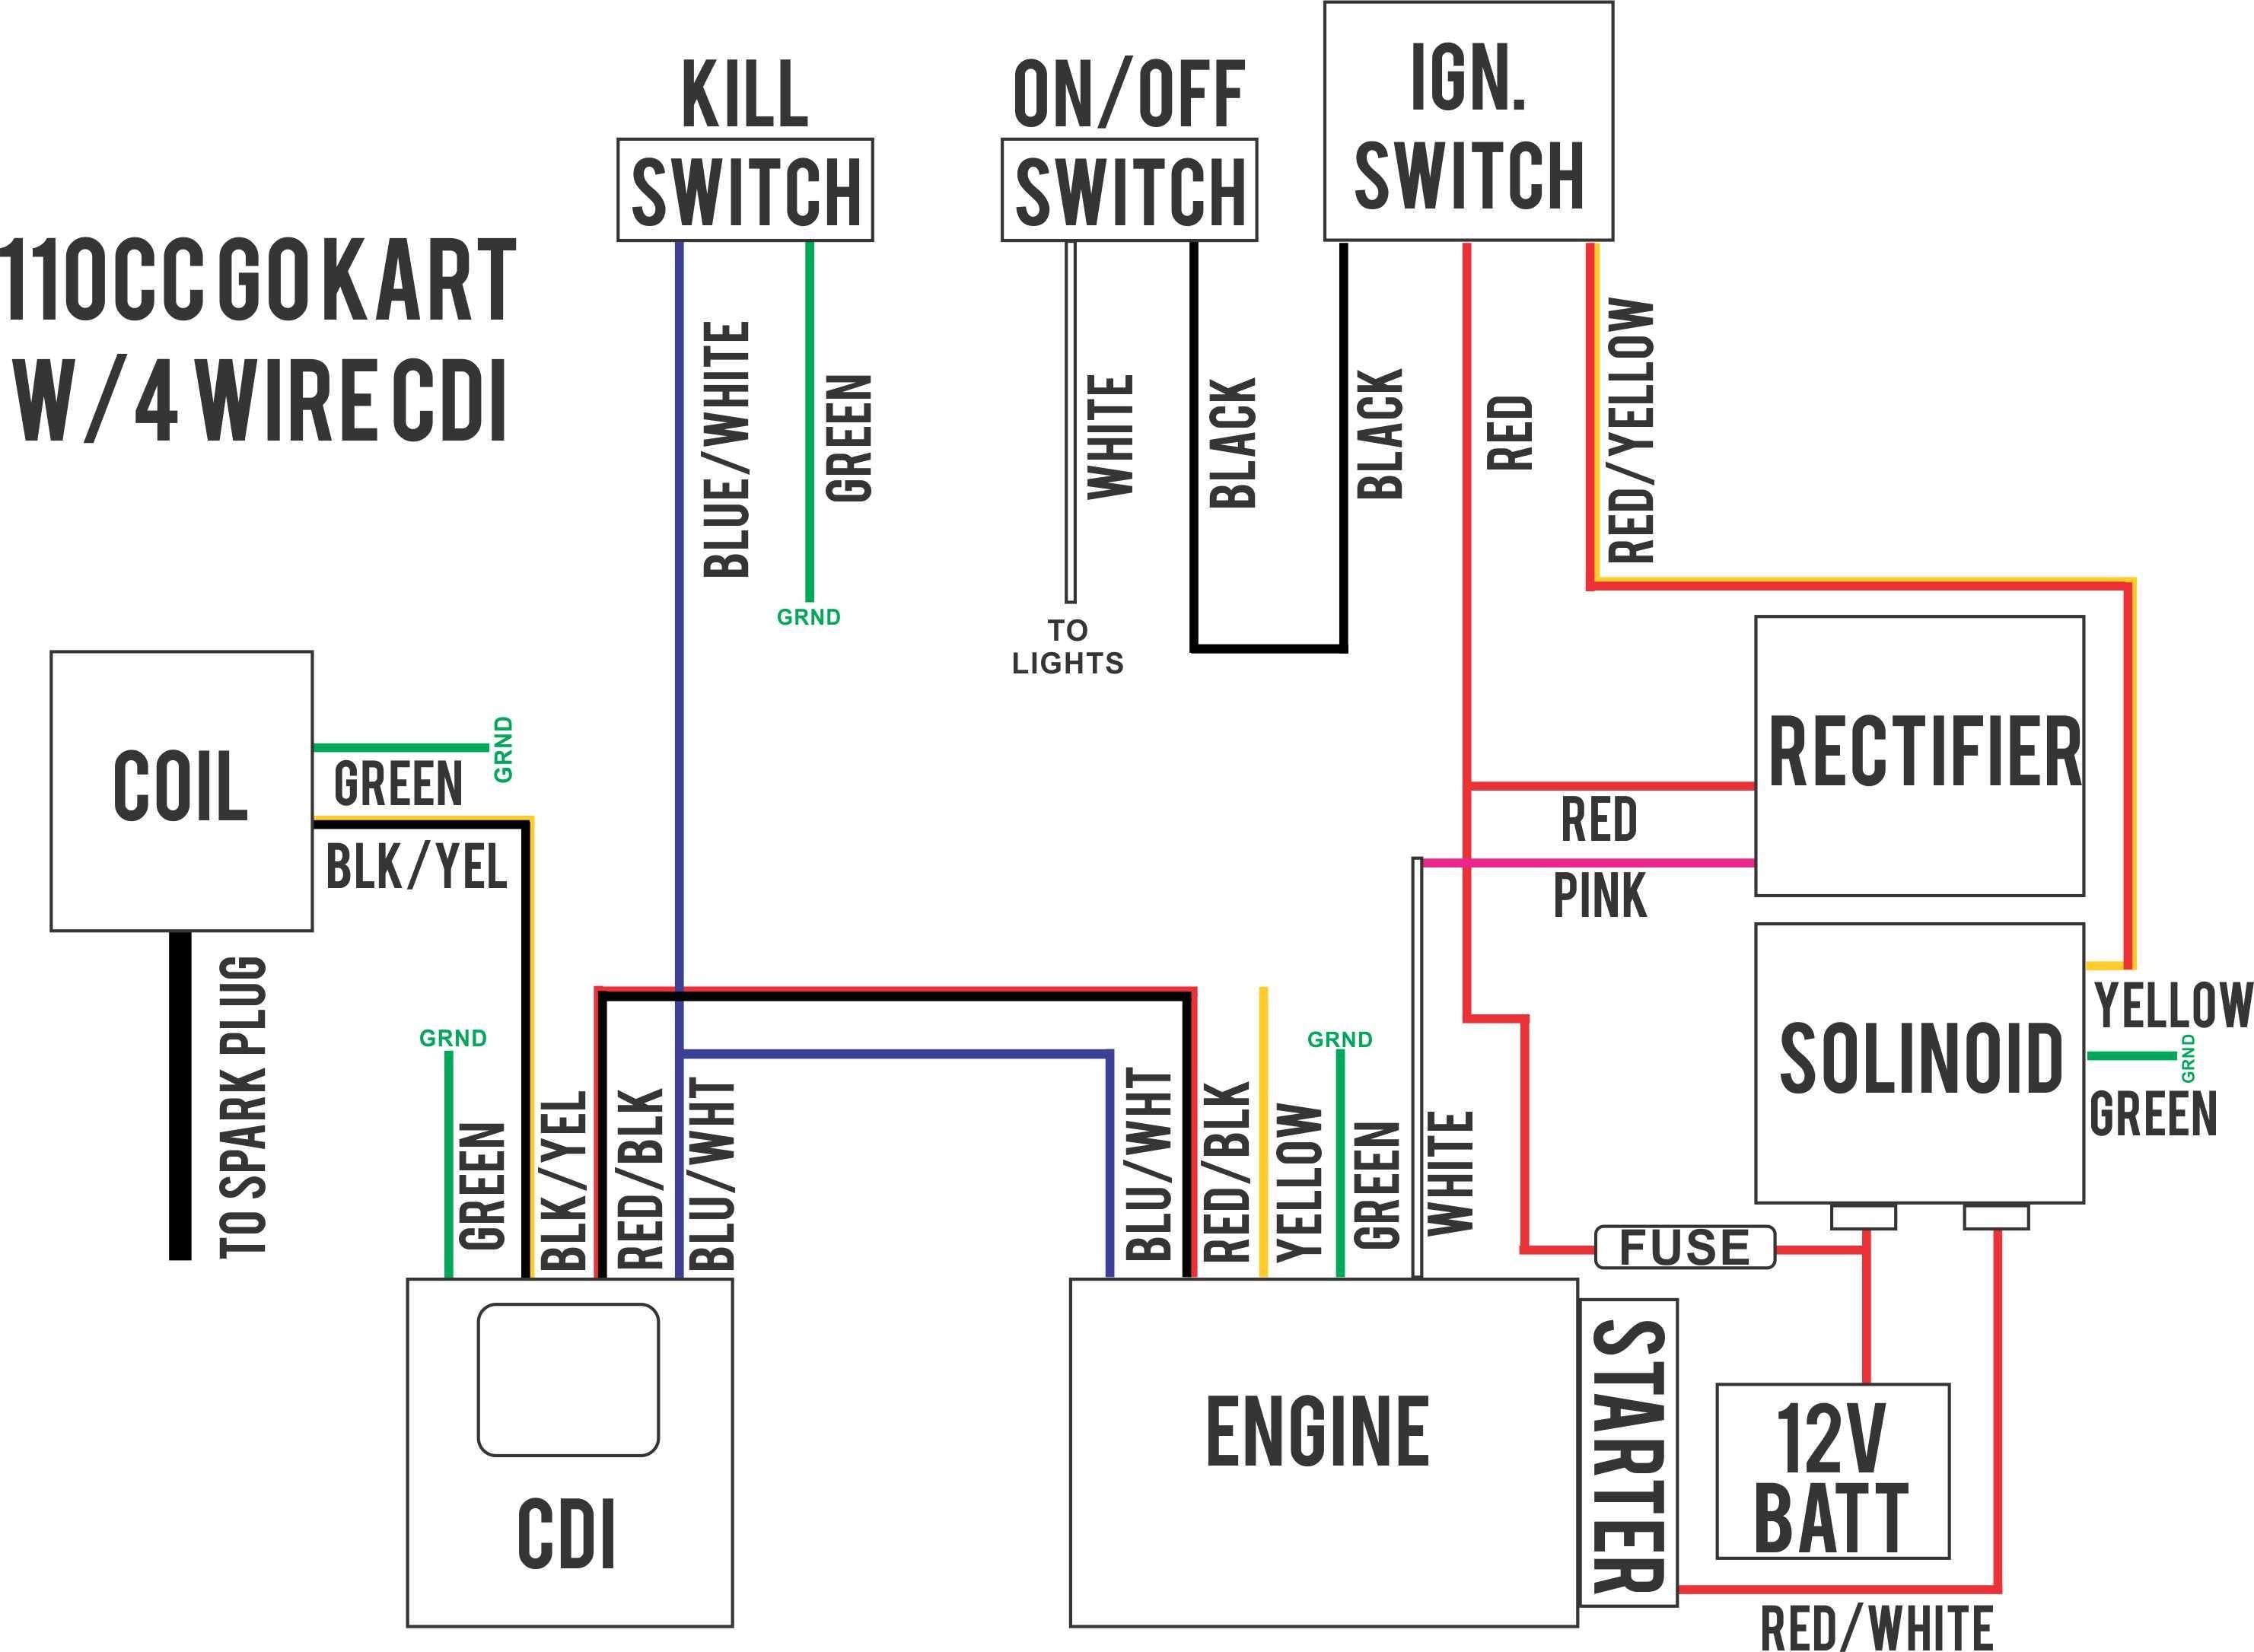 50cc Go Kart Wiring Diagram - Sprinter App Wiring Diagrams -  light-switch.begaya.decorresine.itWiring Diagram Resource